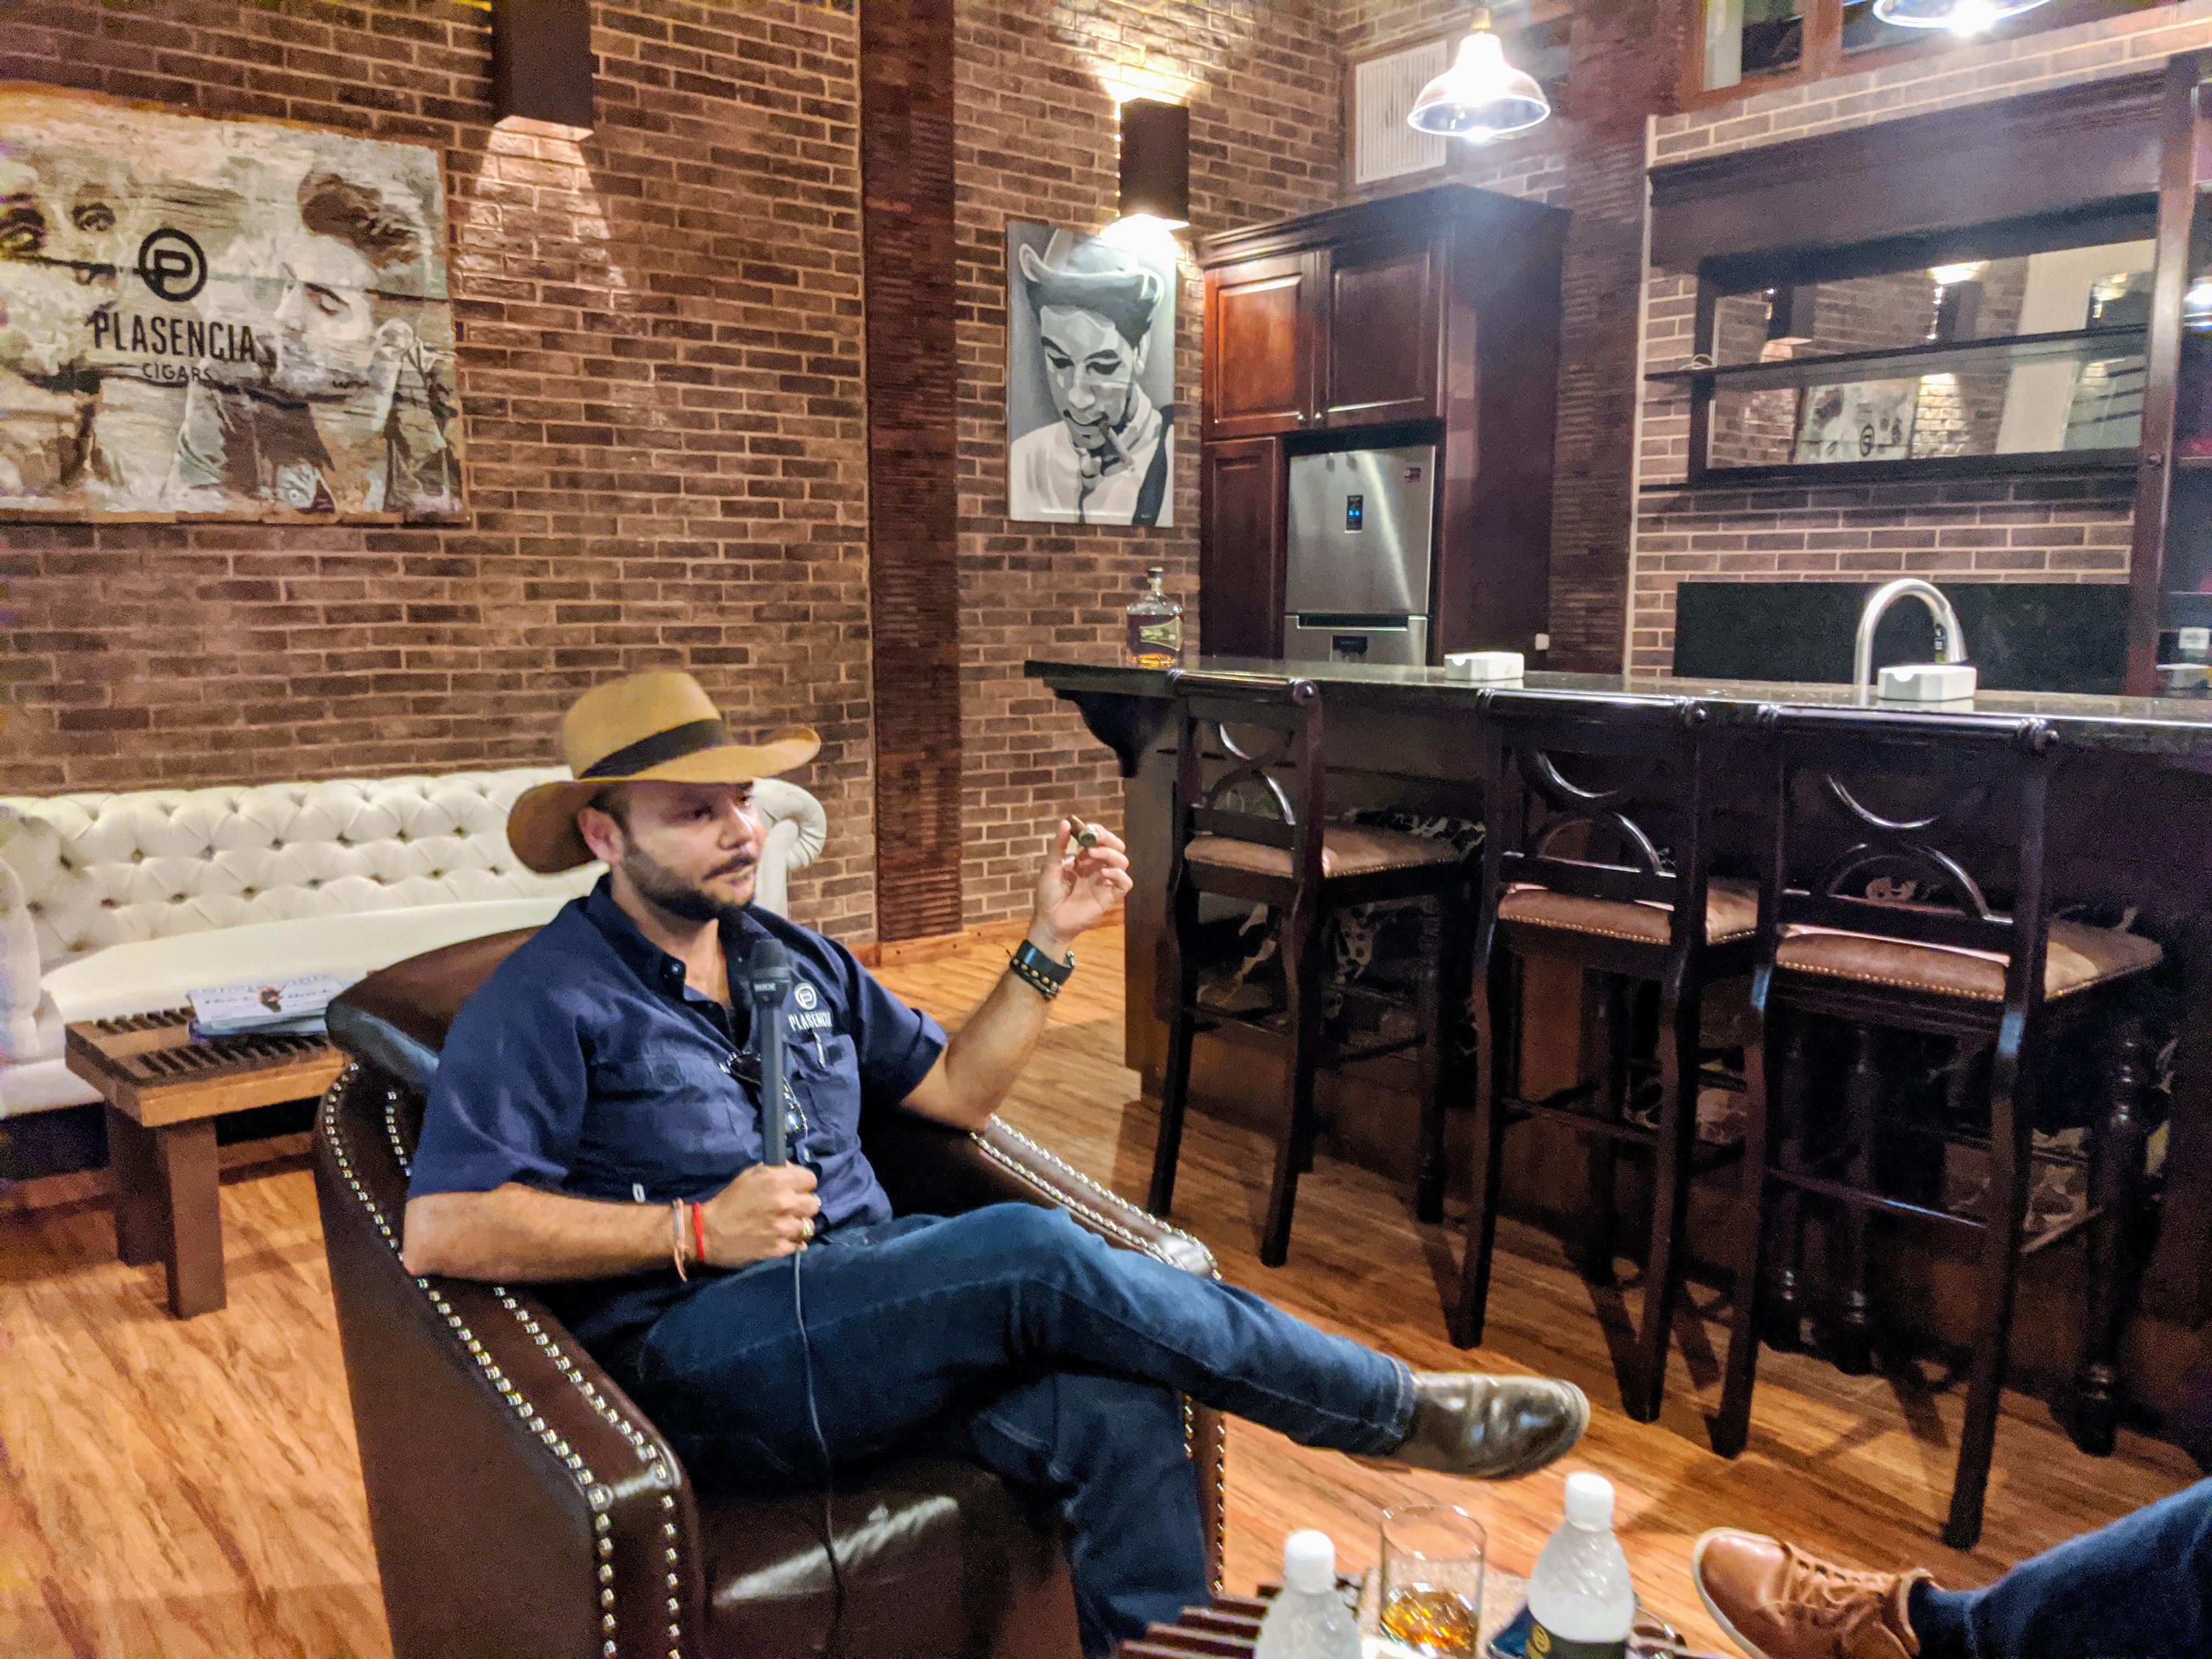 Nestor Andres Plasencia at the Plasencia Cigars factory in Estelí Nicaragua